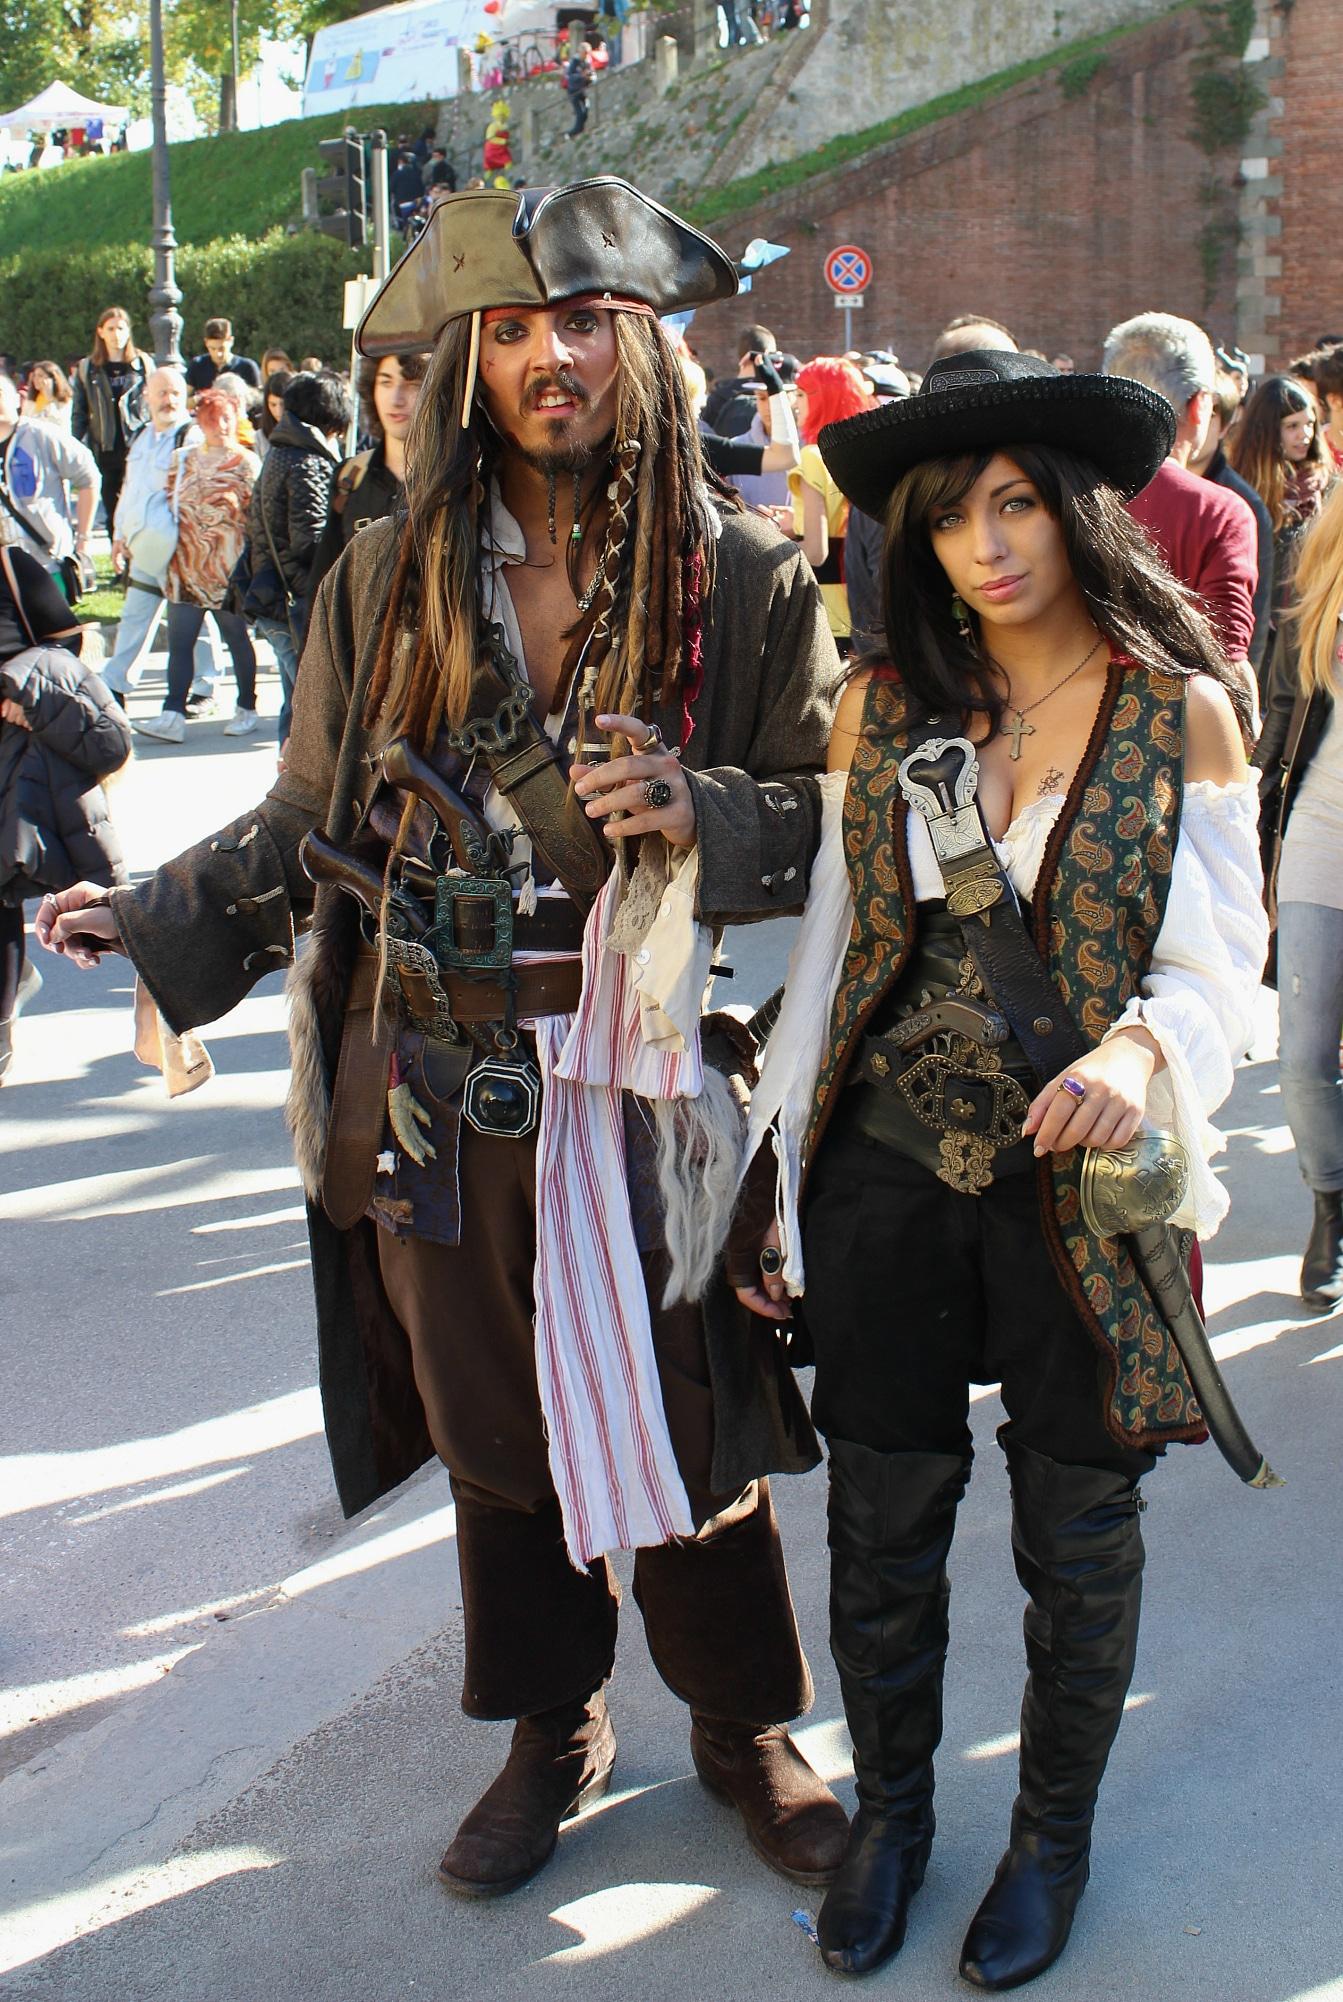 Cosplay Jack Sparrow.